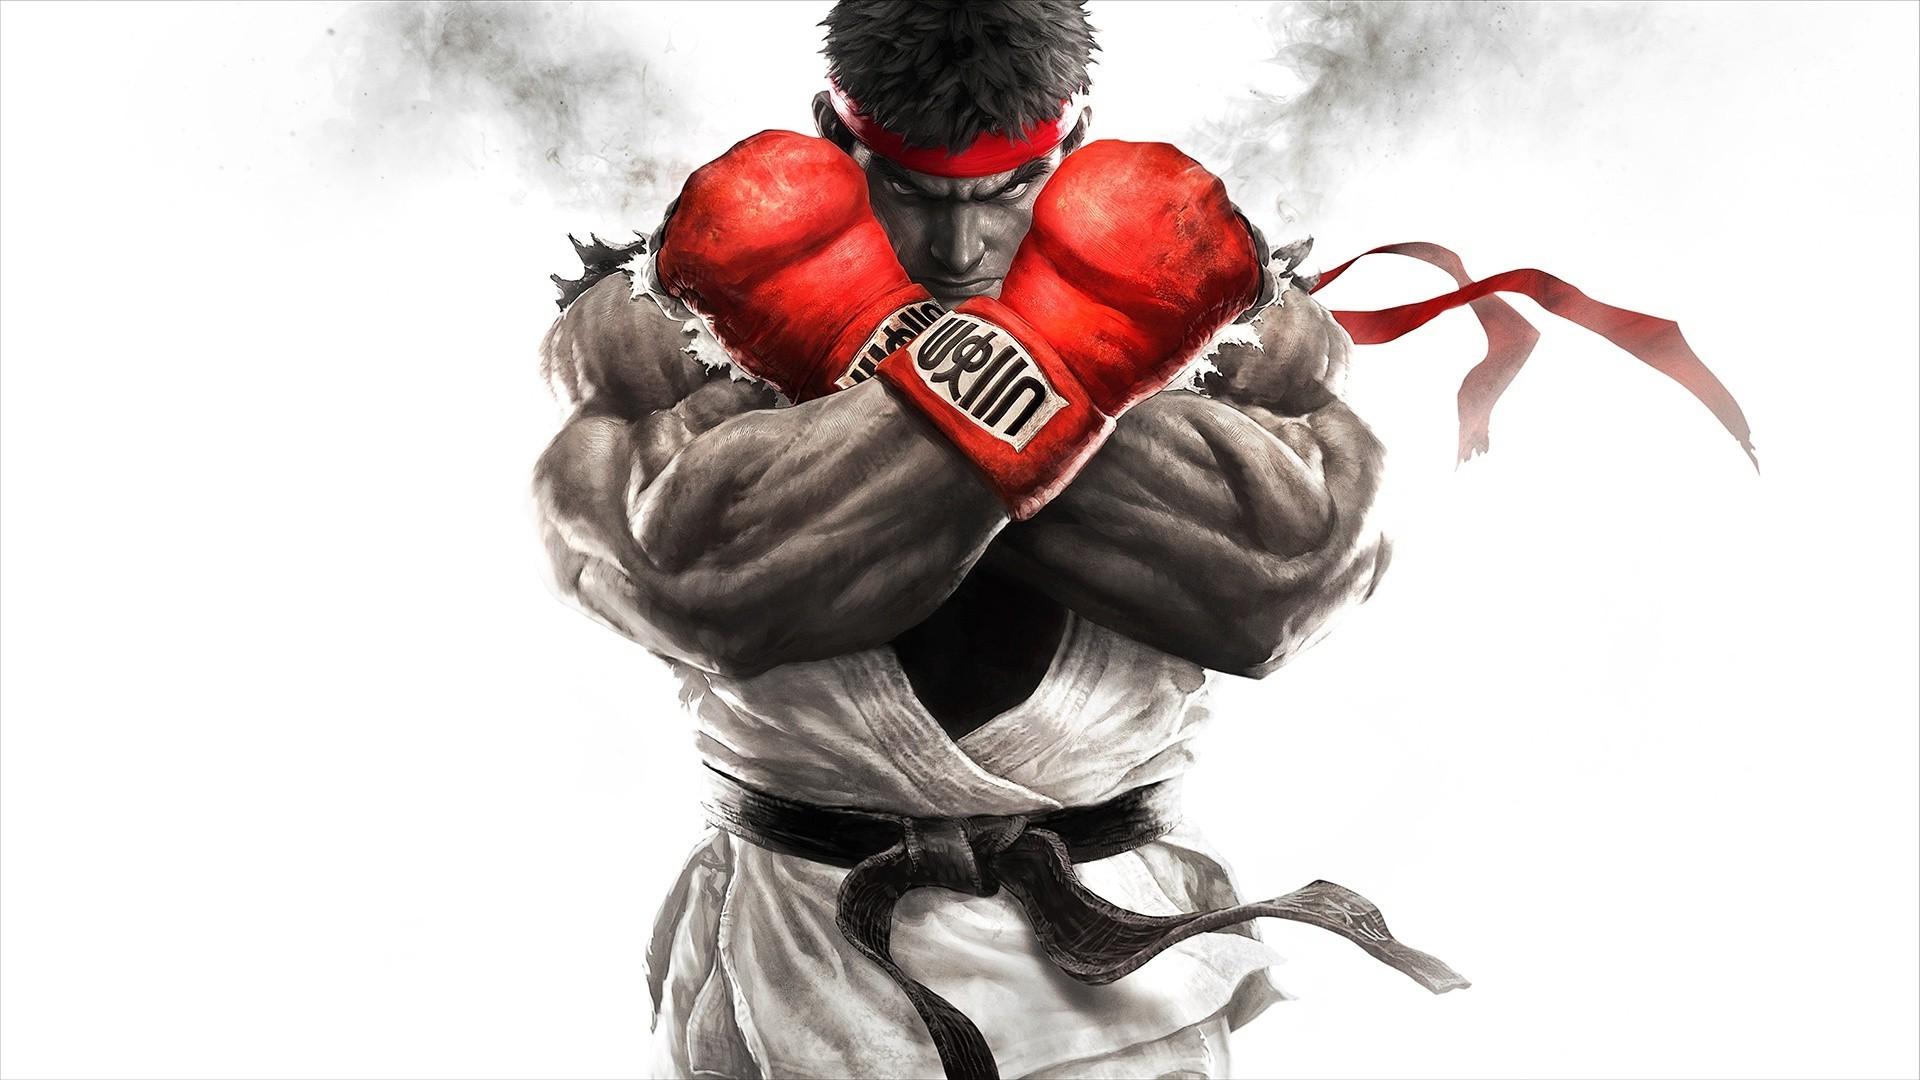 street fighter 5 ryu wallpaper hd